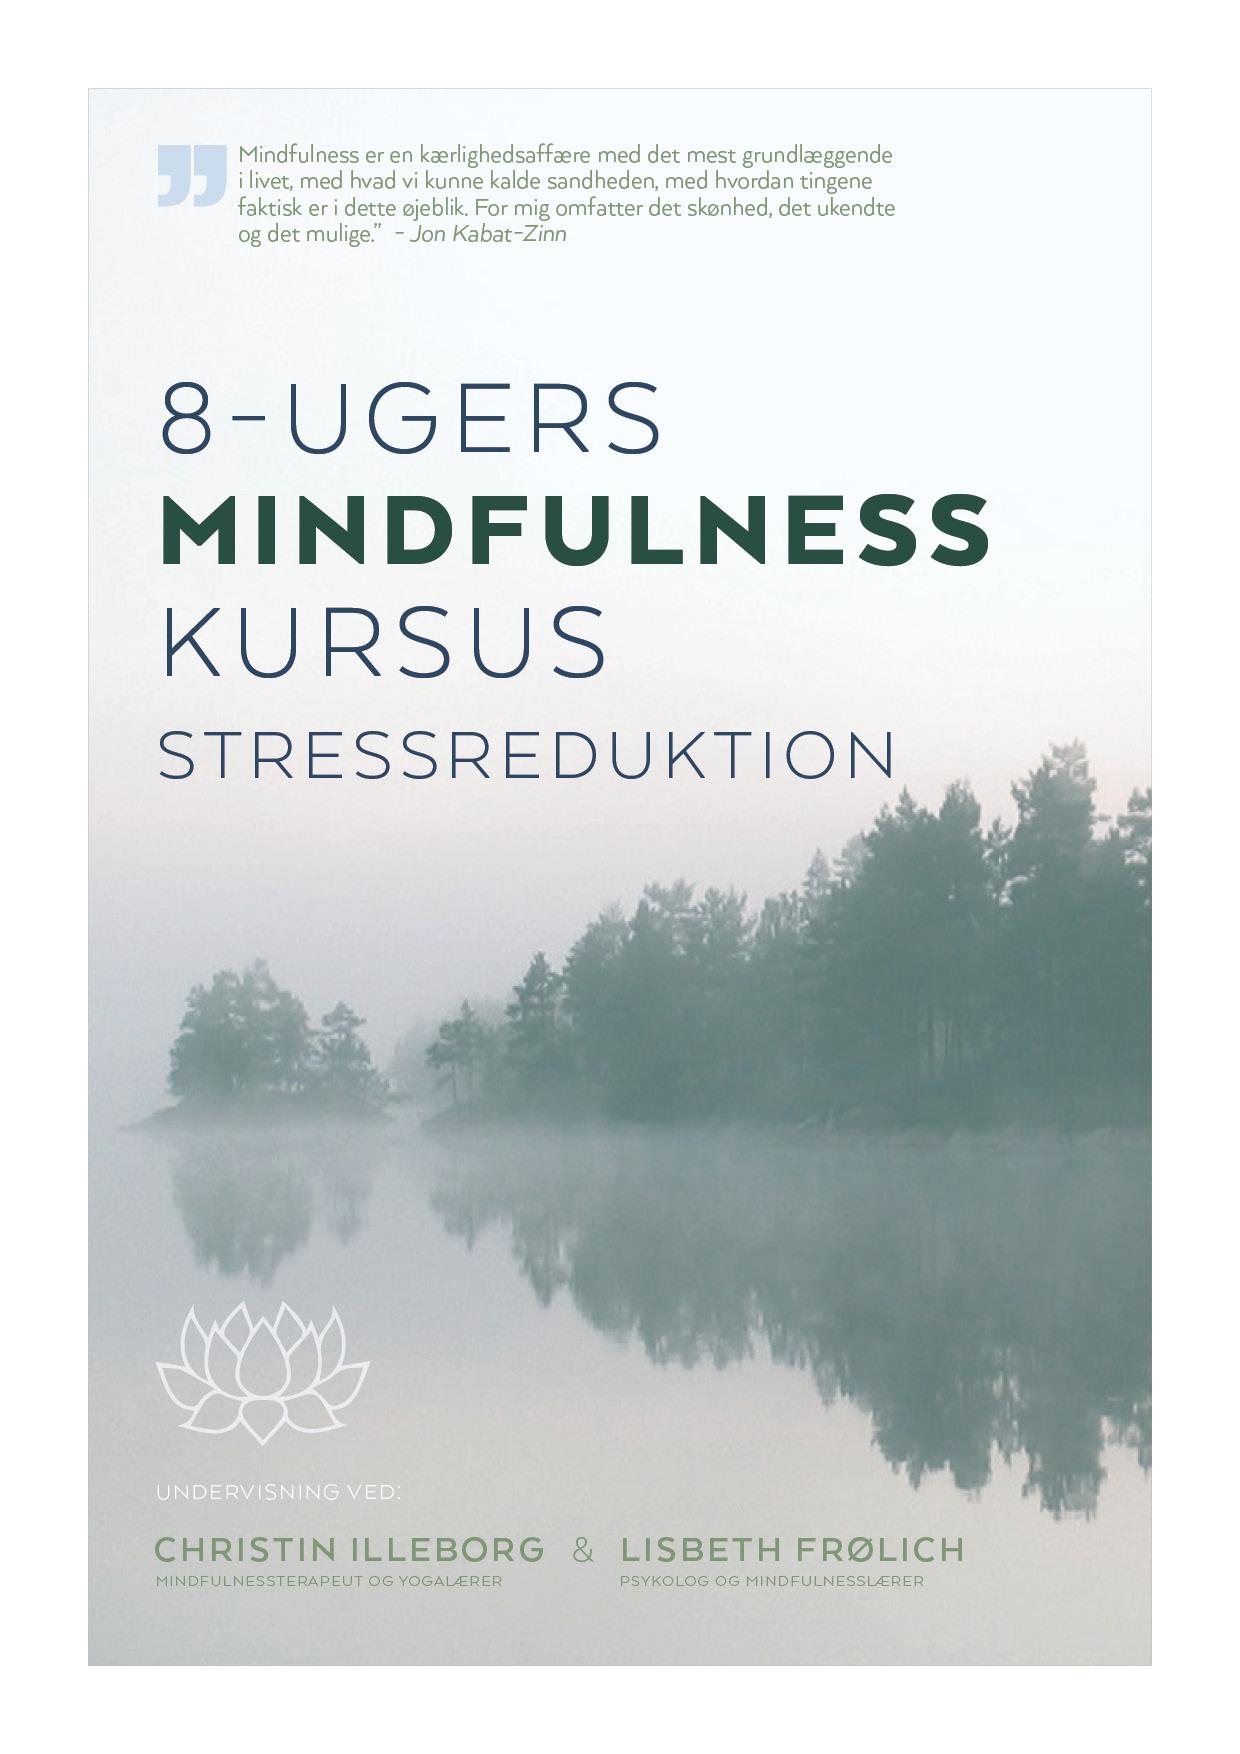 Mindfulness kursus Human Development Se mere Human Development